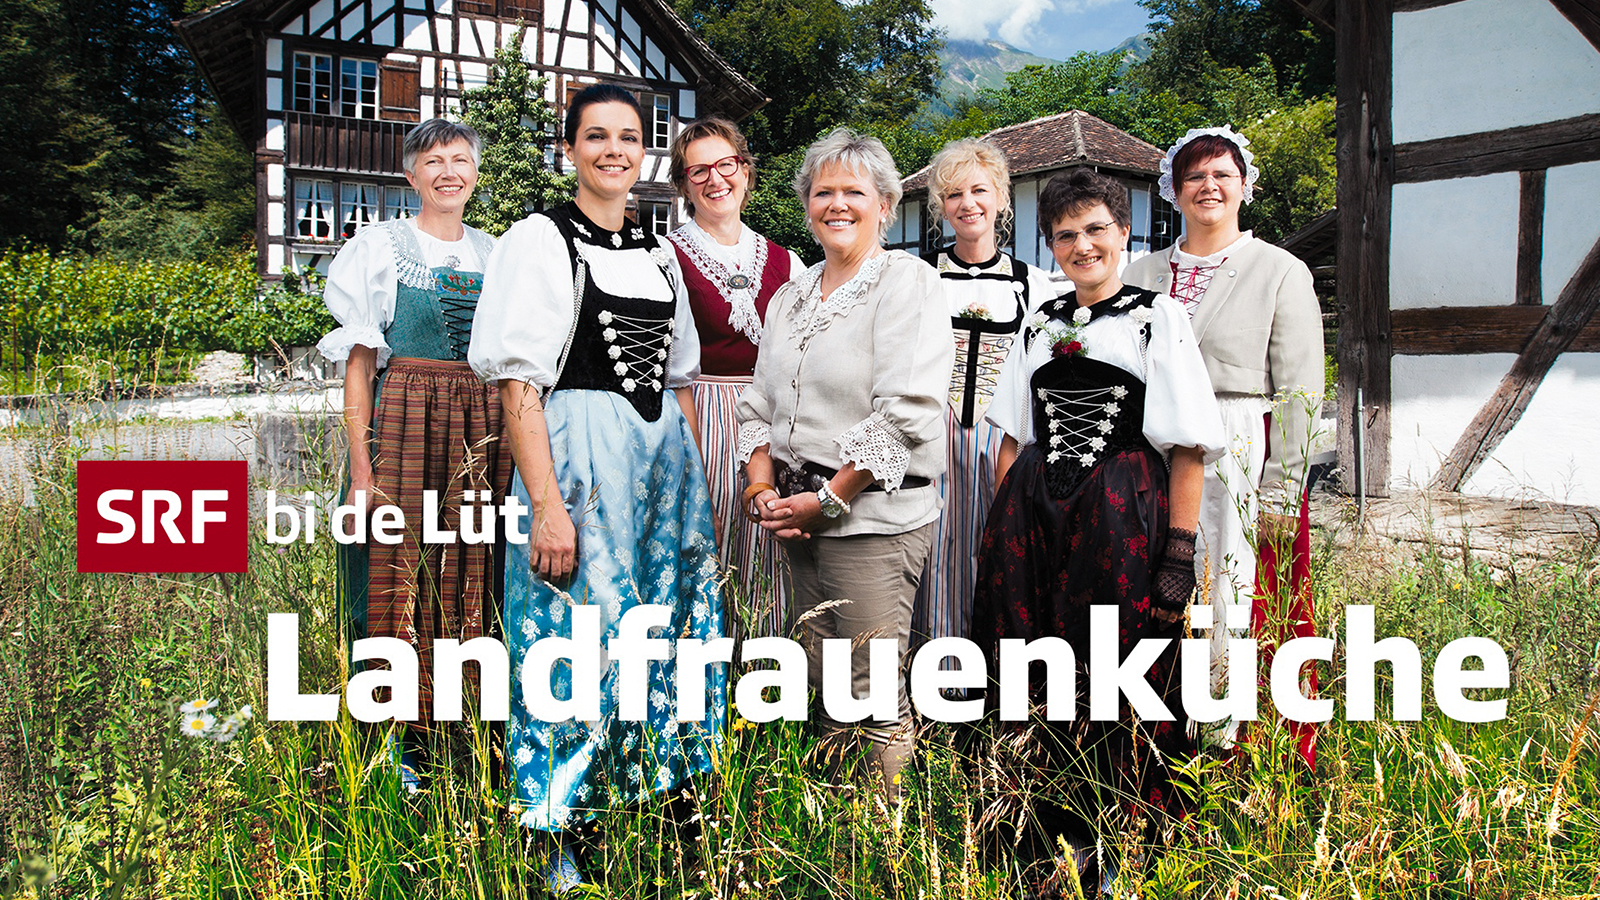 swiss tavolata explorer, tanja bisacca, dongio ti | swisstavolata.ch - Landfrauen Küche